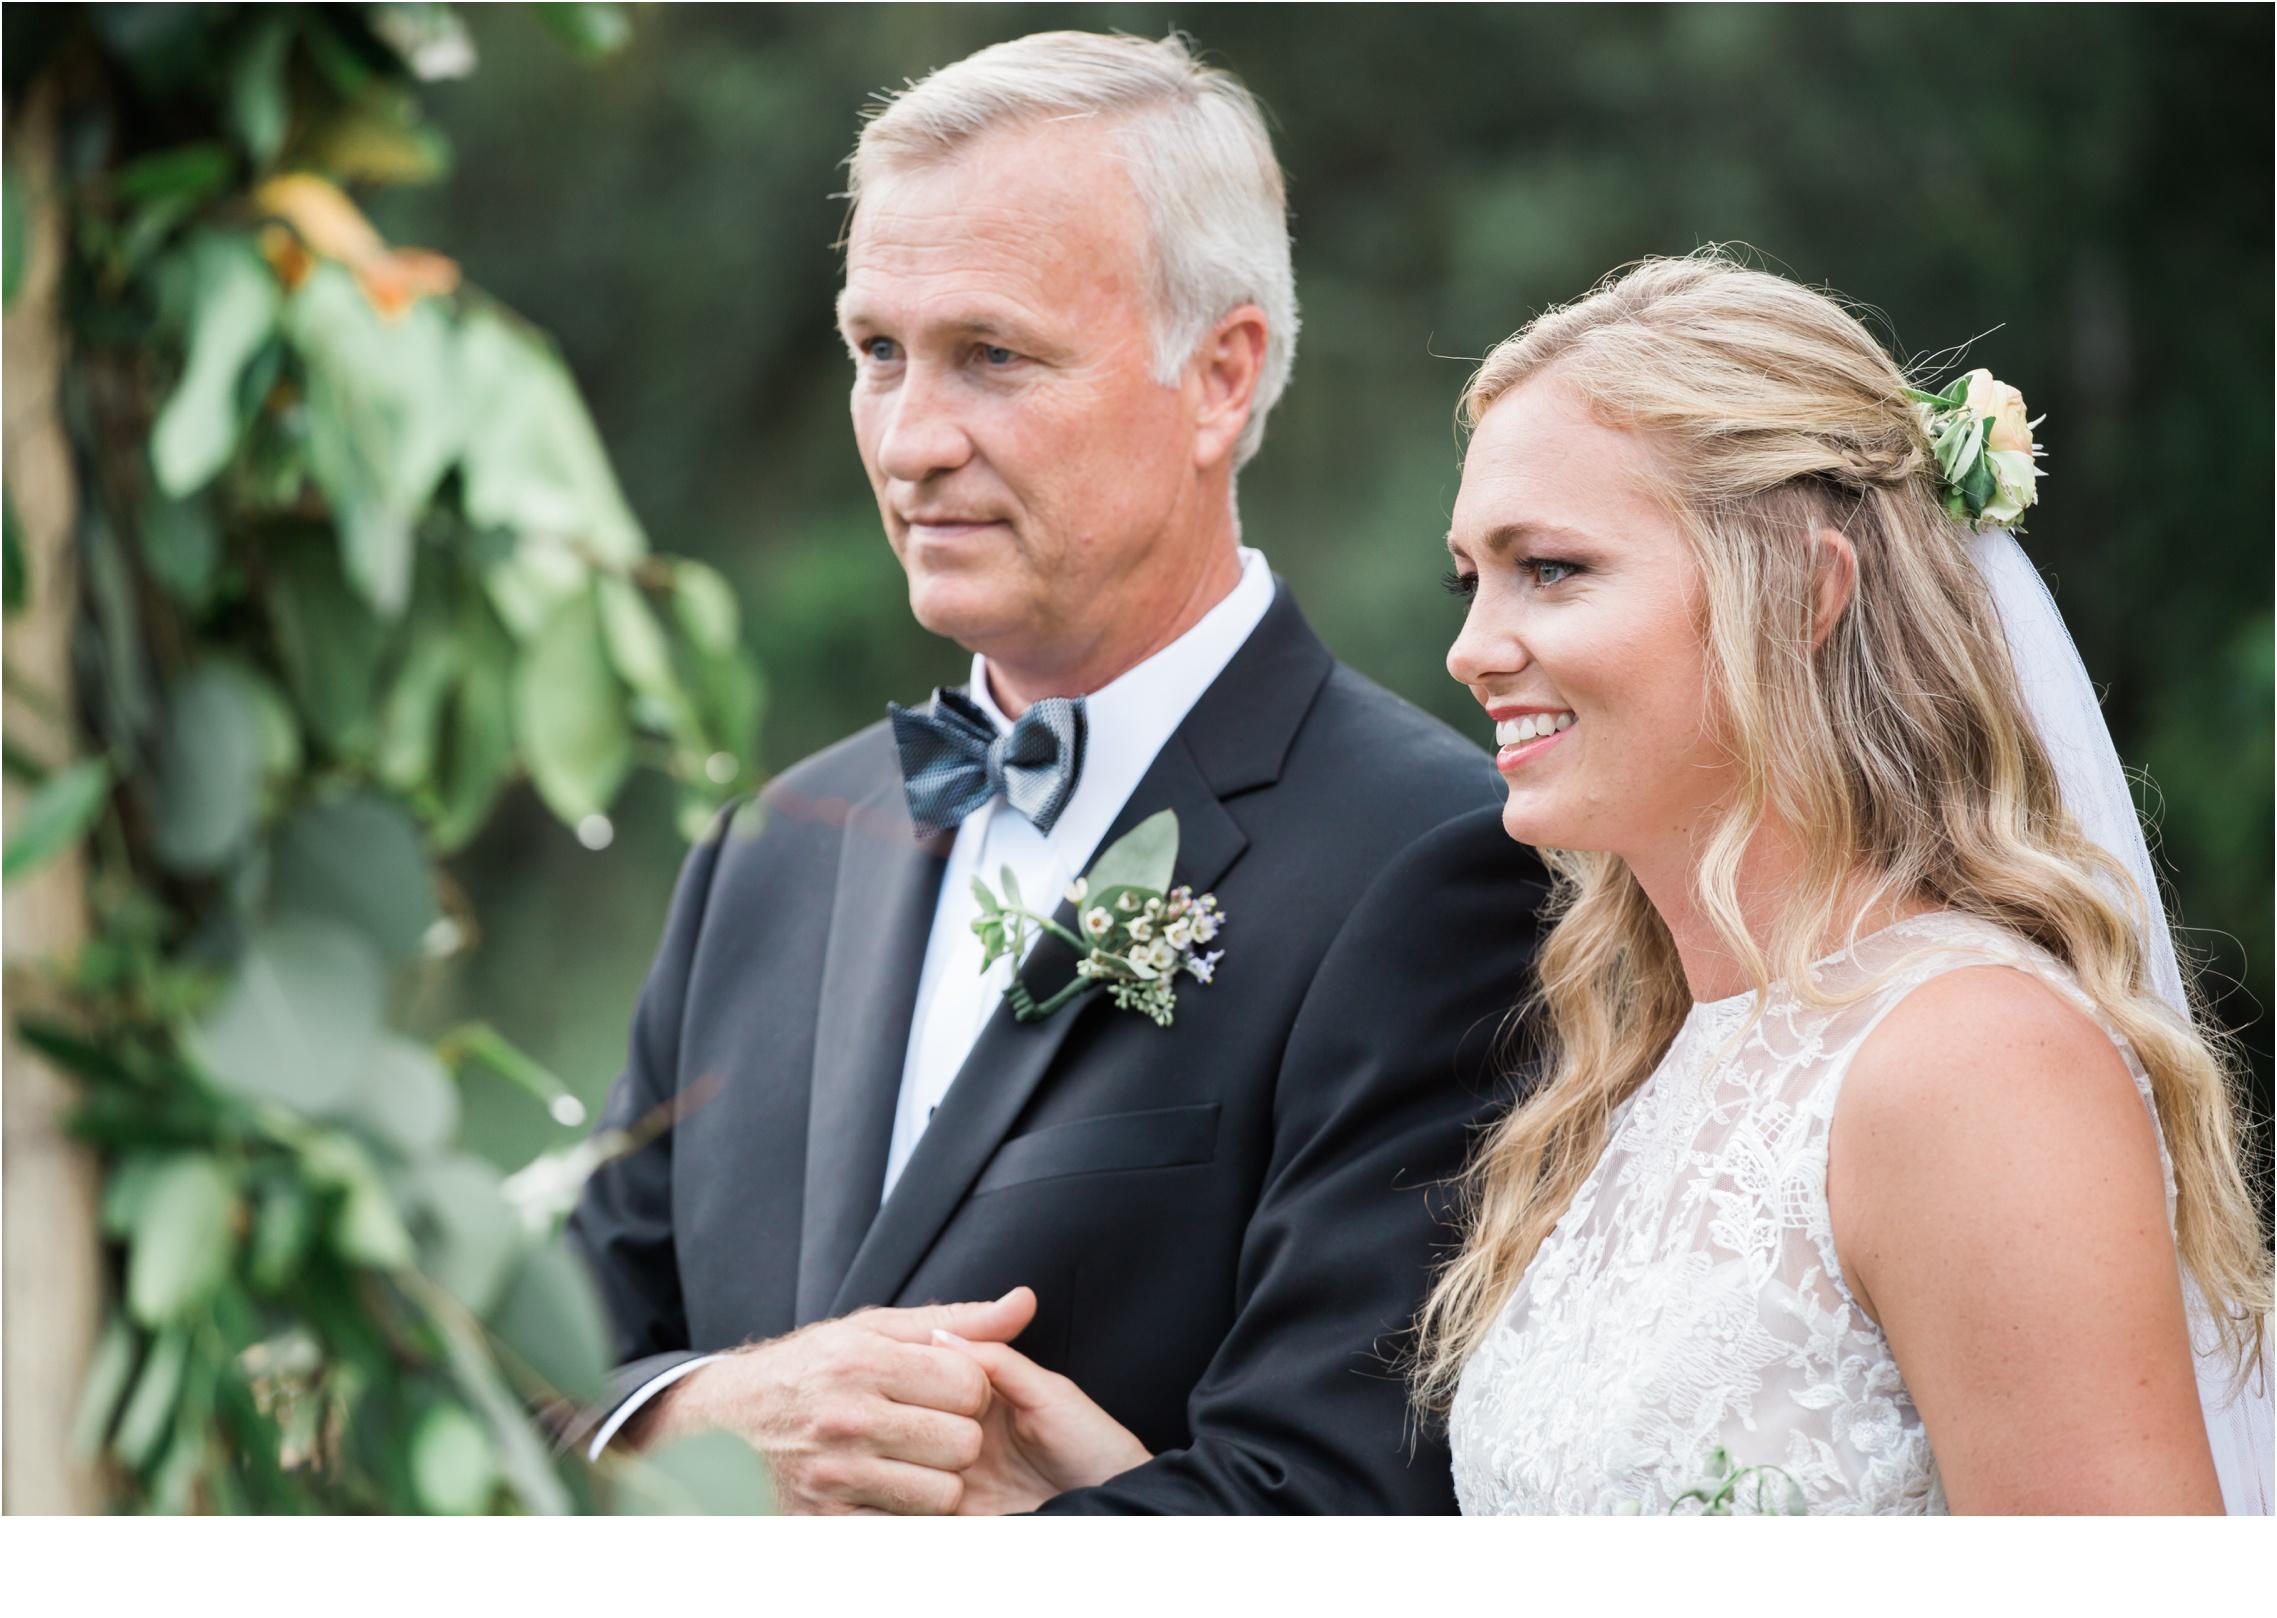 Rainey_Gregg_Photography_St._Simons_Island_Georgia_California_Wedding_Portrait_Photography_0072.jpg